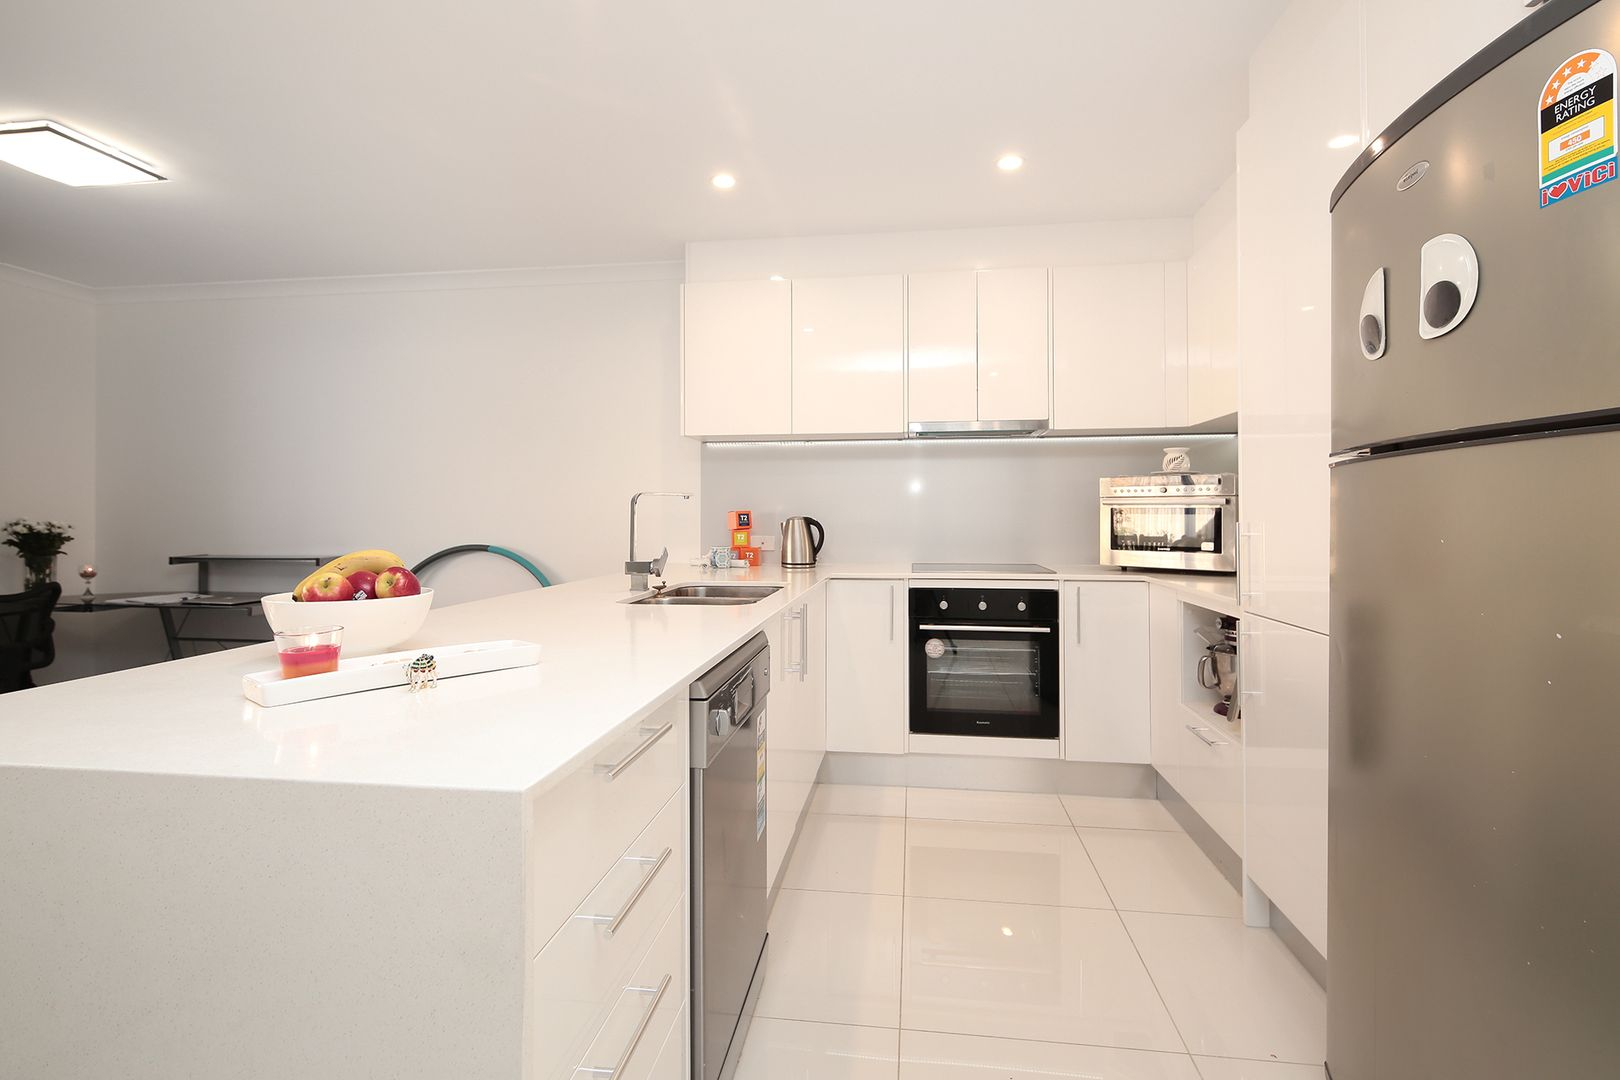 46/105 Barbaralla Drive, Springwood QLD 4127, Image 1